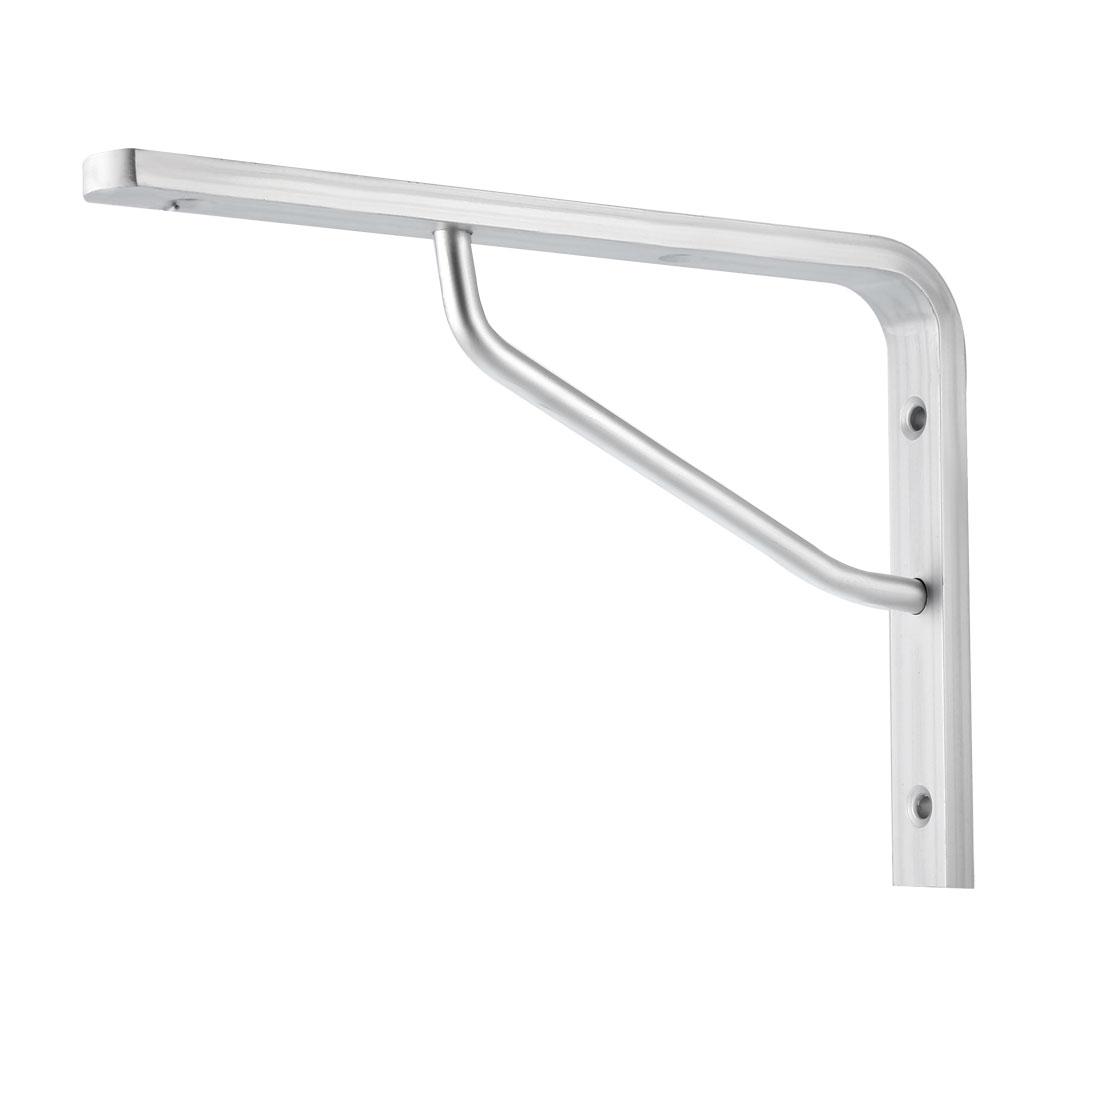 "Shelf Bracket, 8.5""L x 5.7""H x 0.3""T Right Angle Bracket Aluminum Alloy 2pcs"